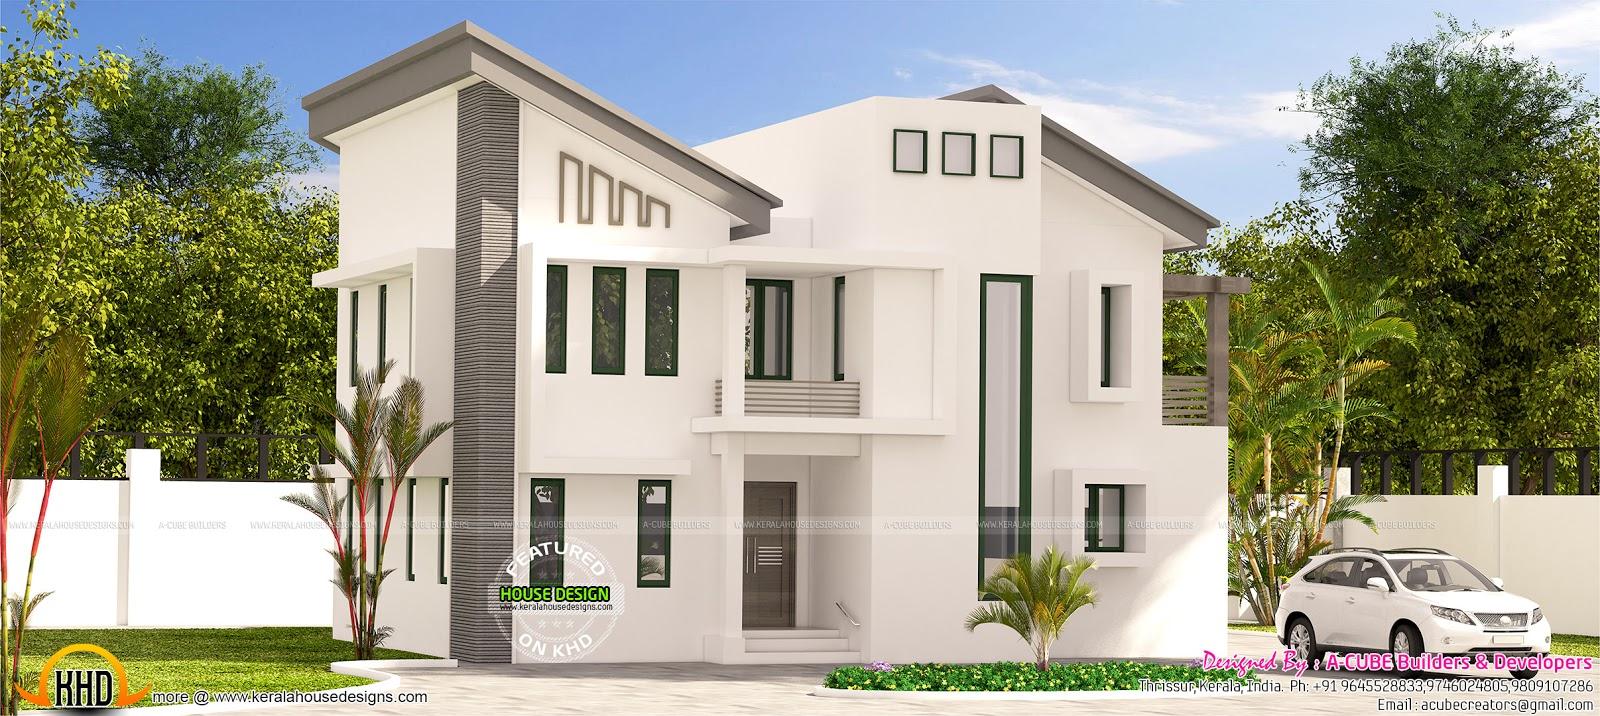 2100 sq-ft slanting roof modern home - Kerala home design ...